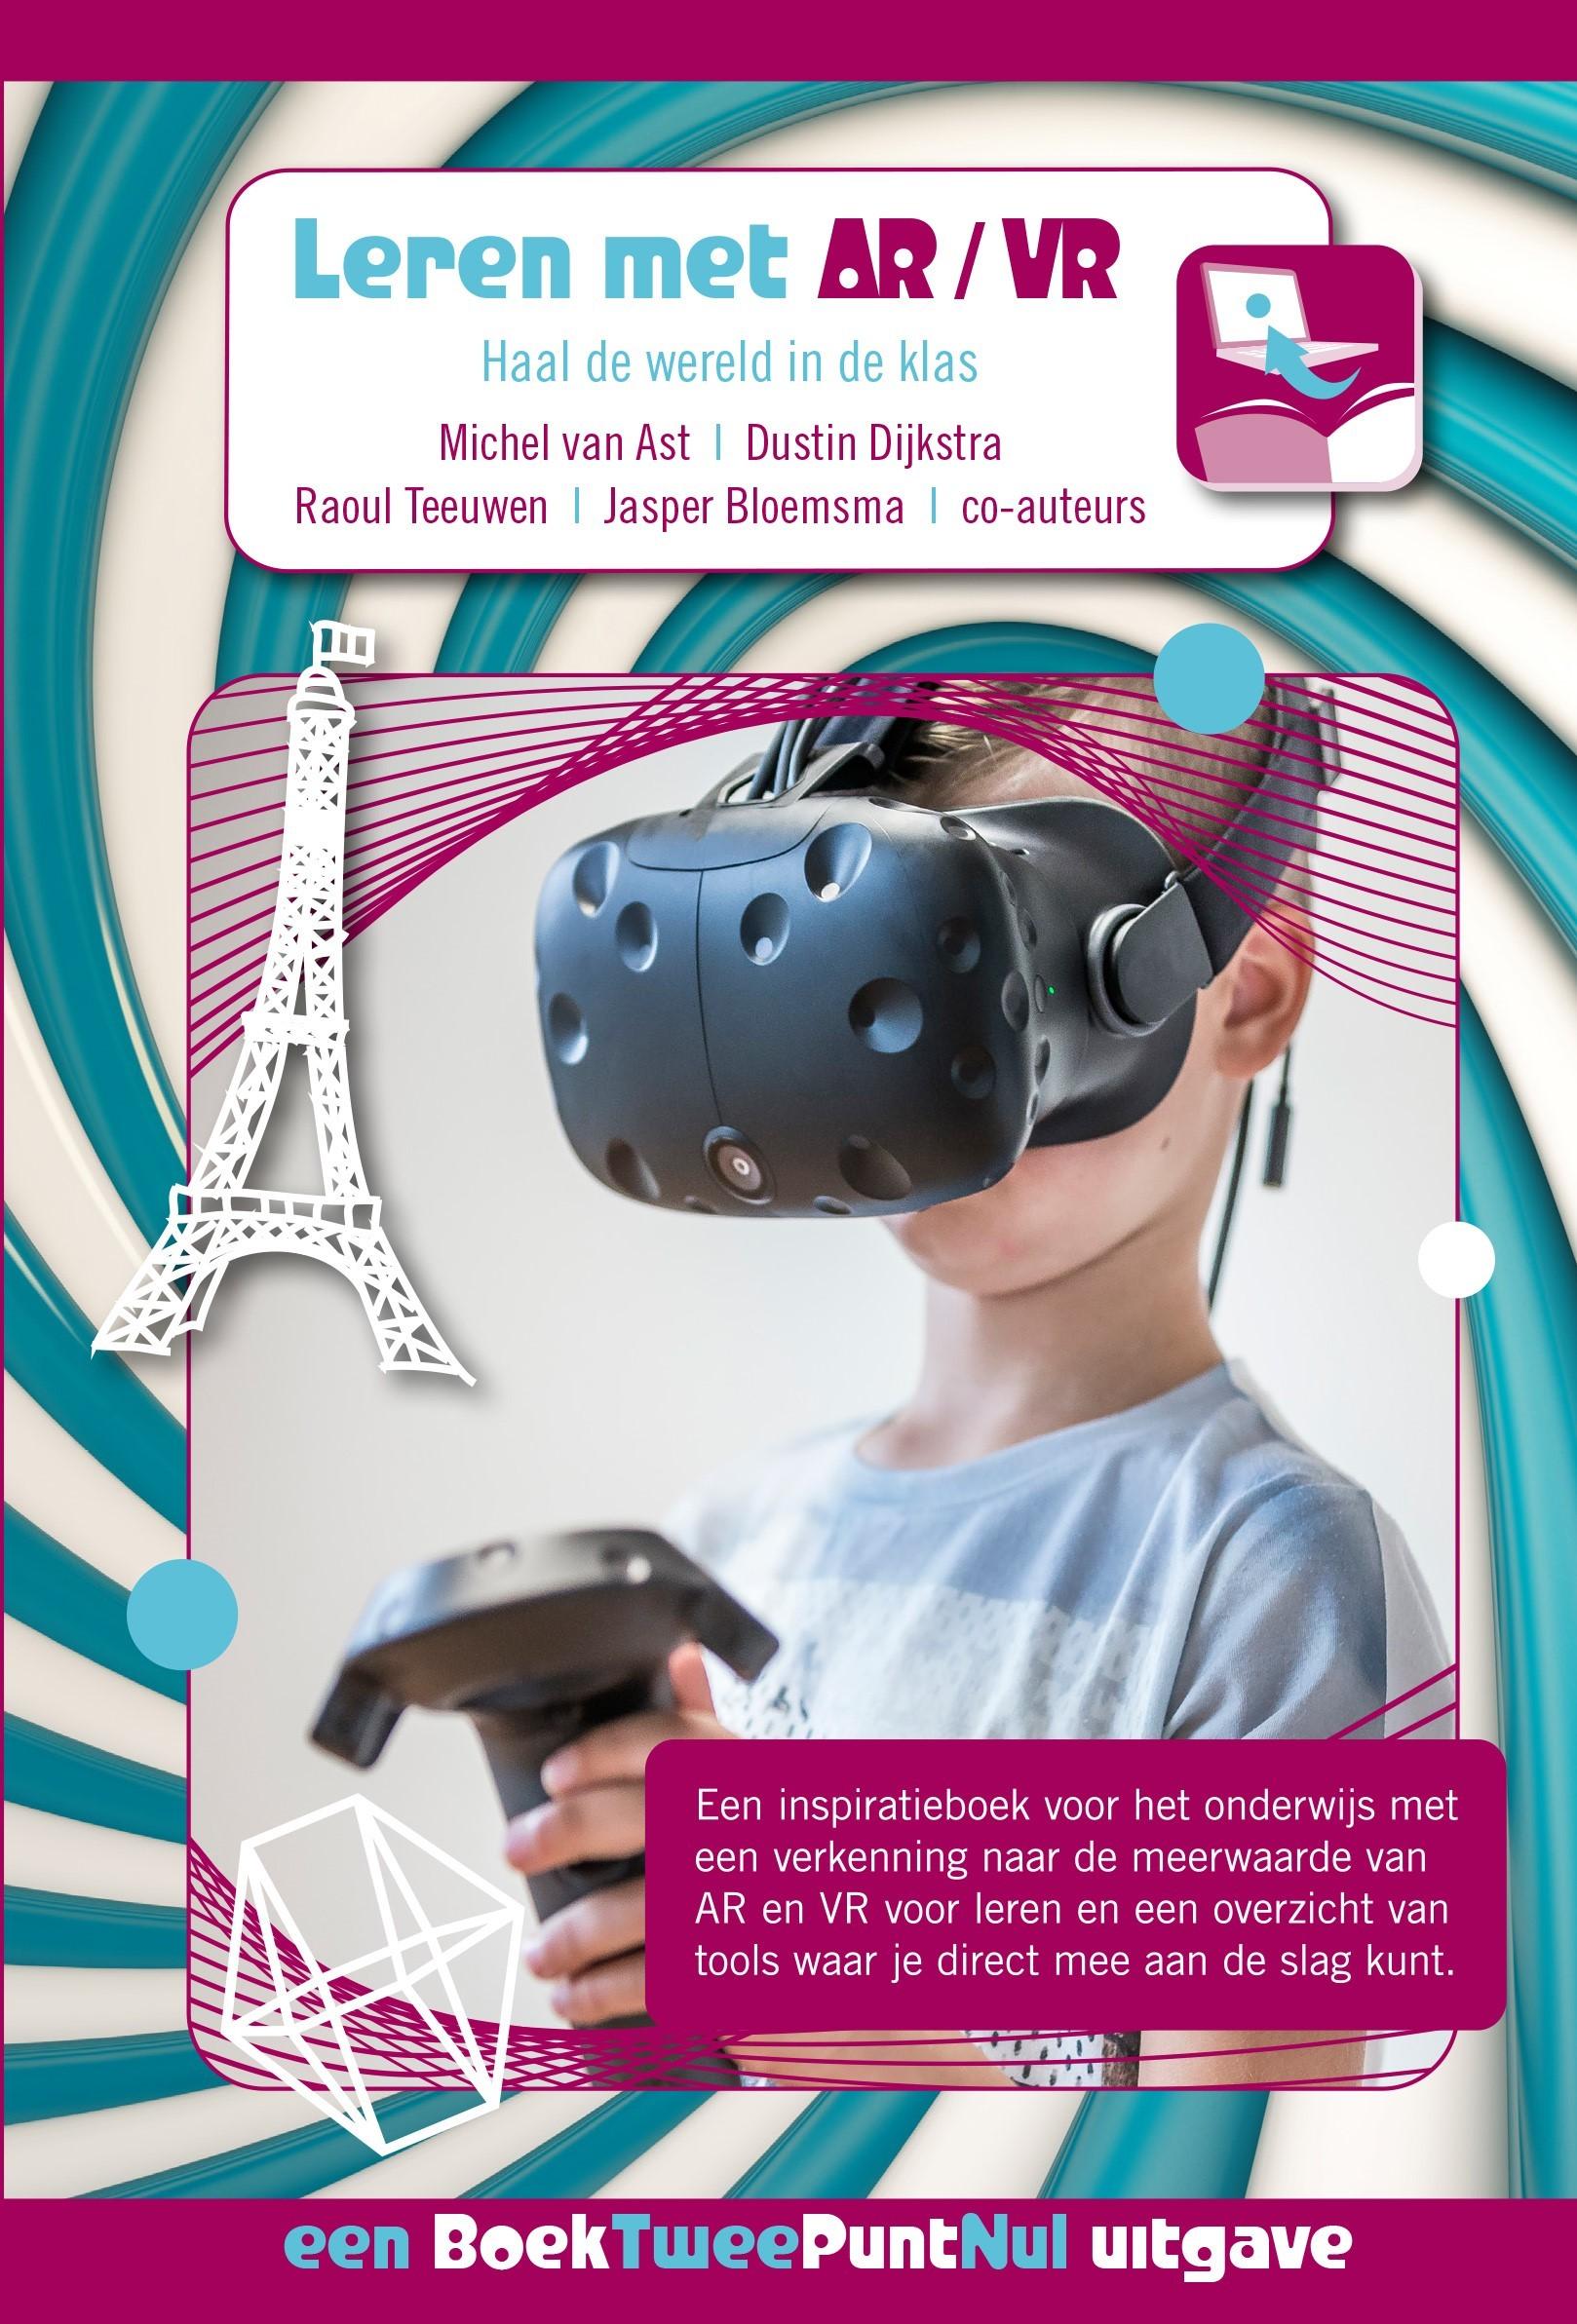 Leren met AR/VR omslag